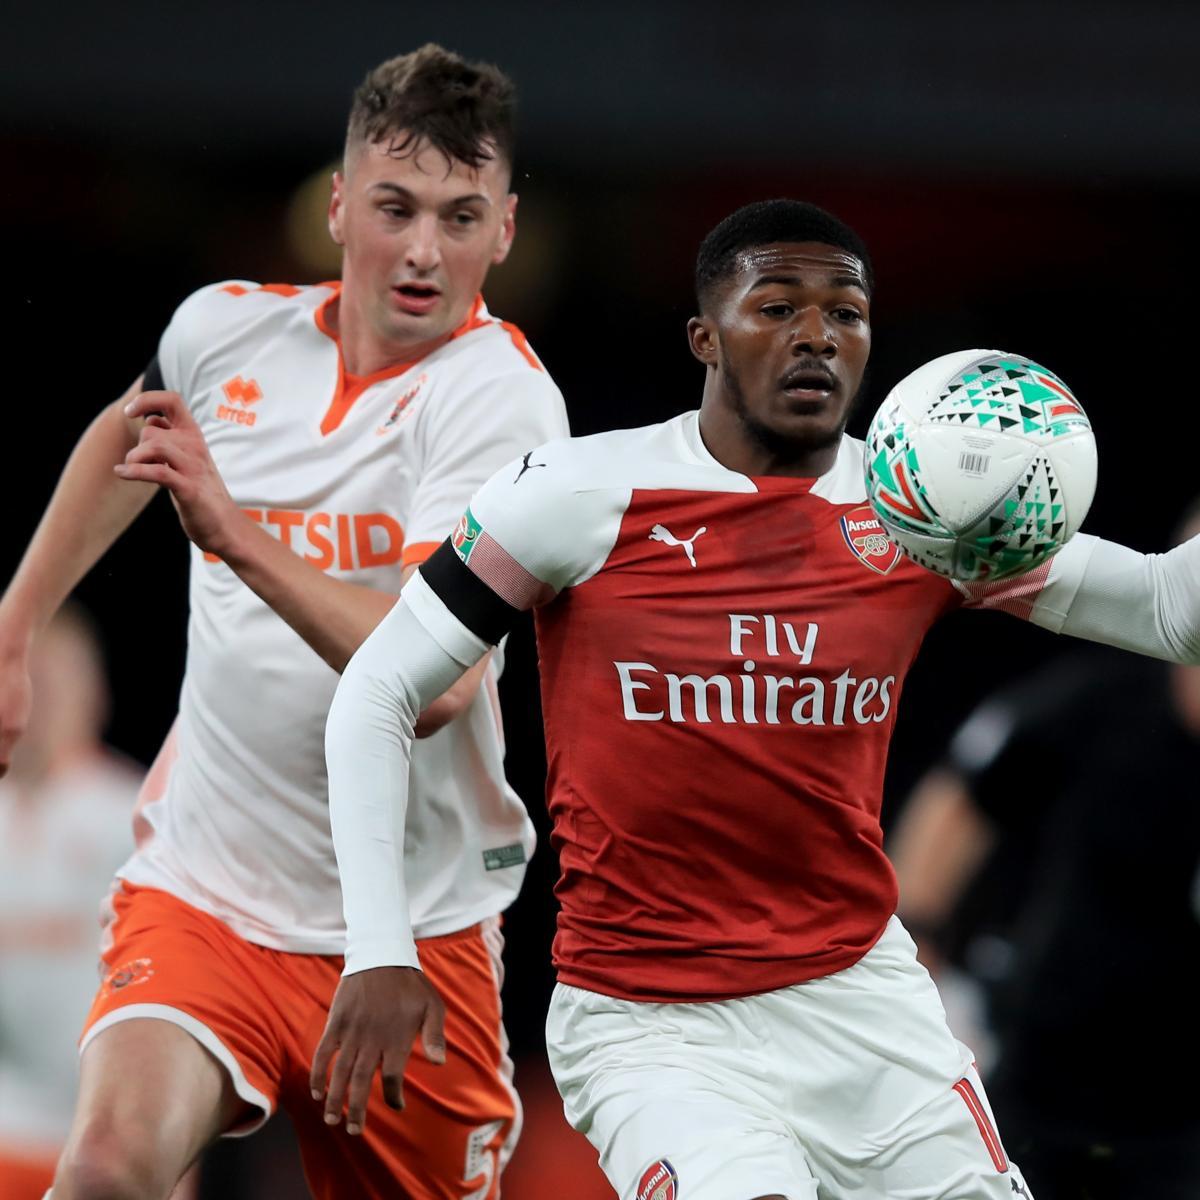 Arsenal Vs Barcelona Live Score Highlights From: Blackpool Vs. Arsenal: FA Cup 2019 Odds, Live Stream, TV